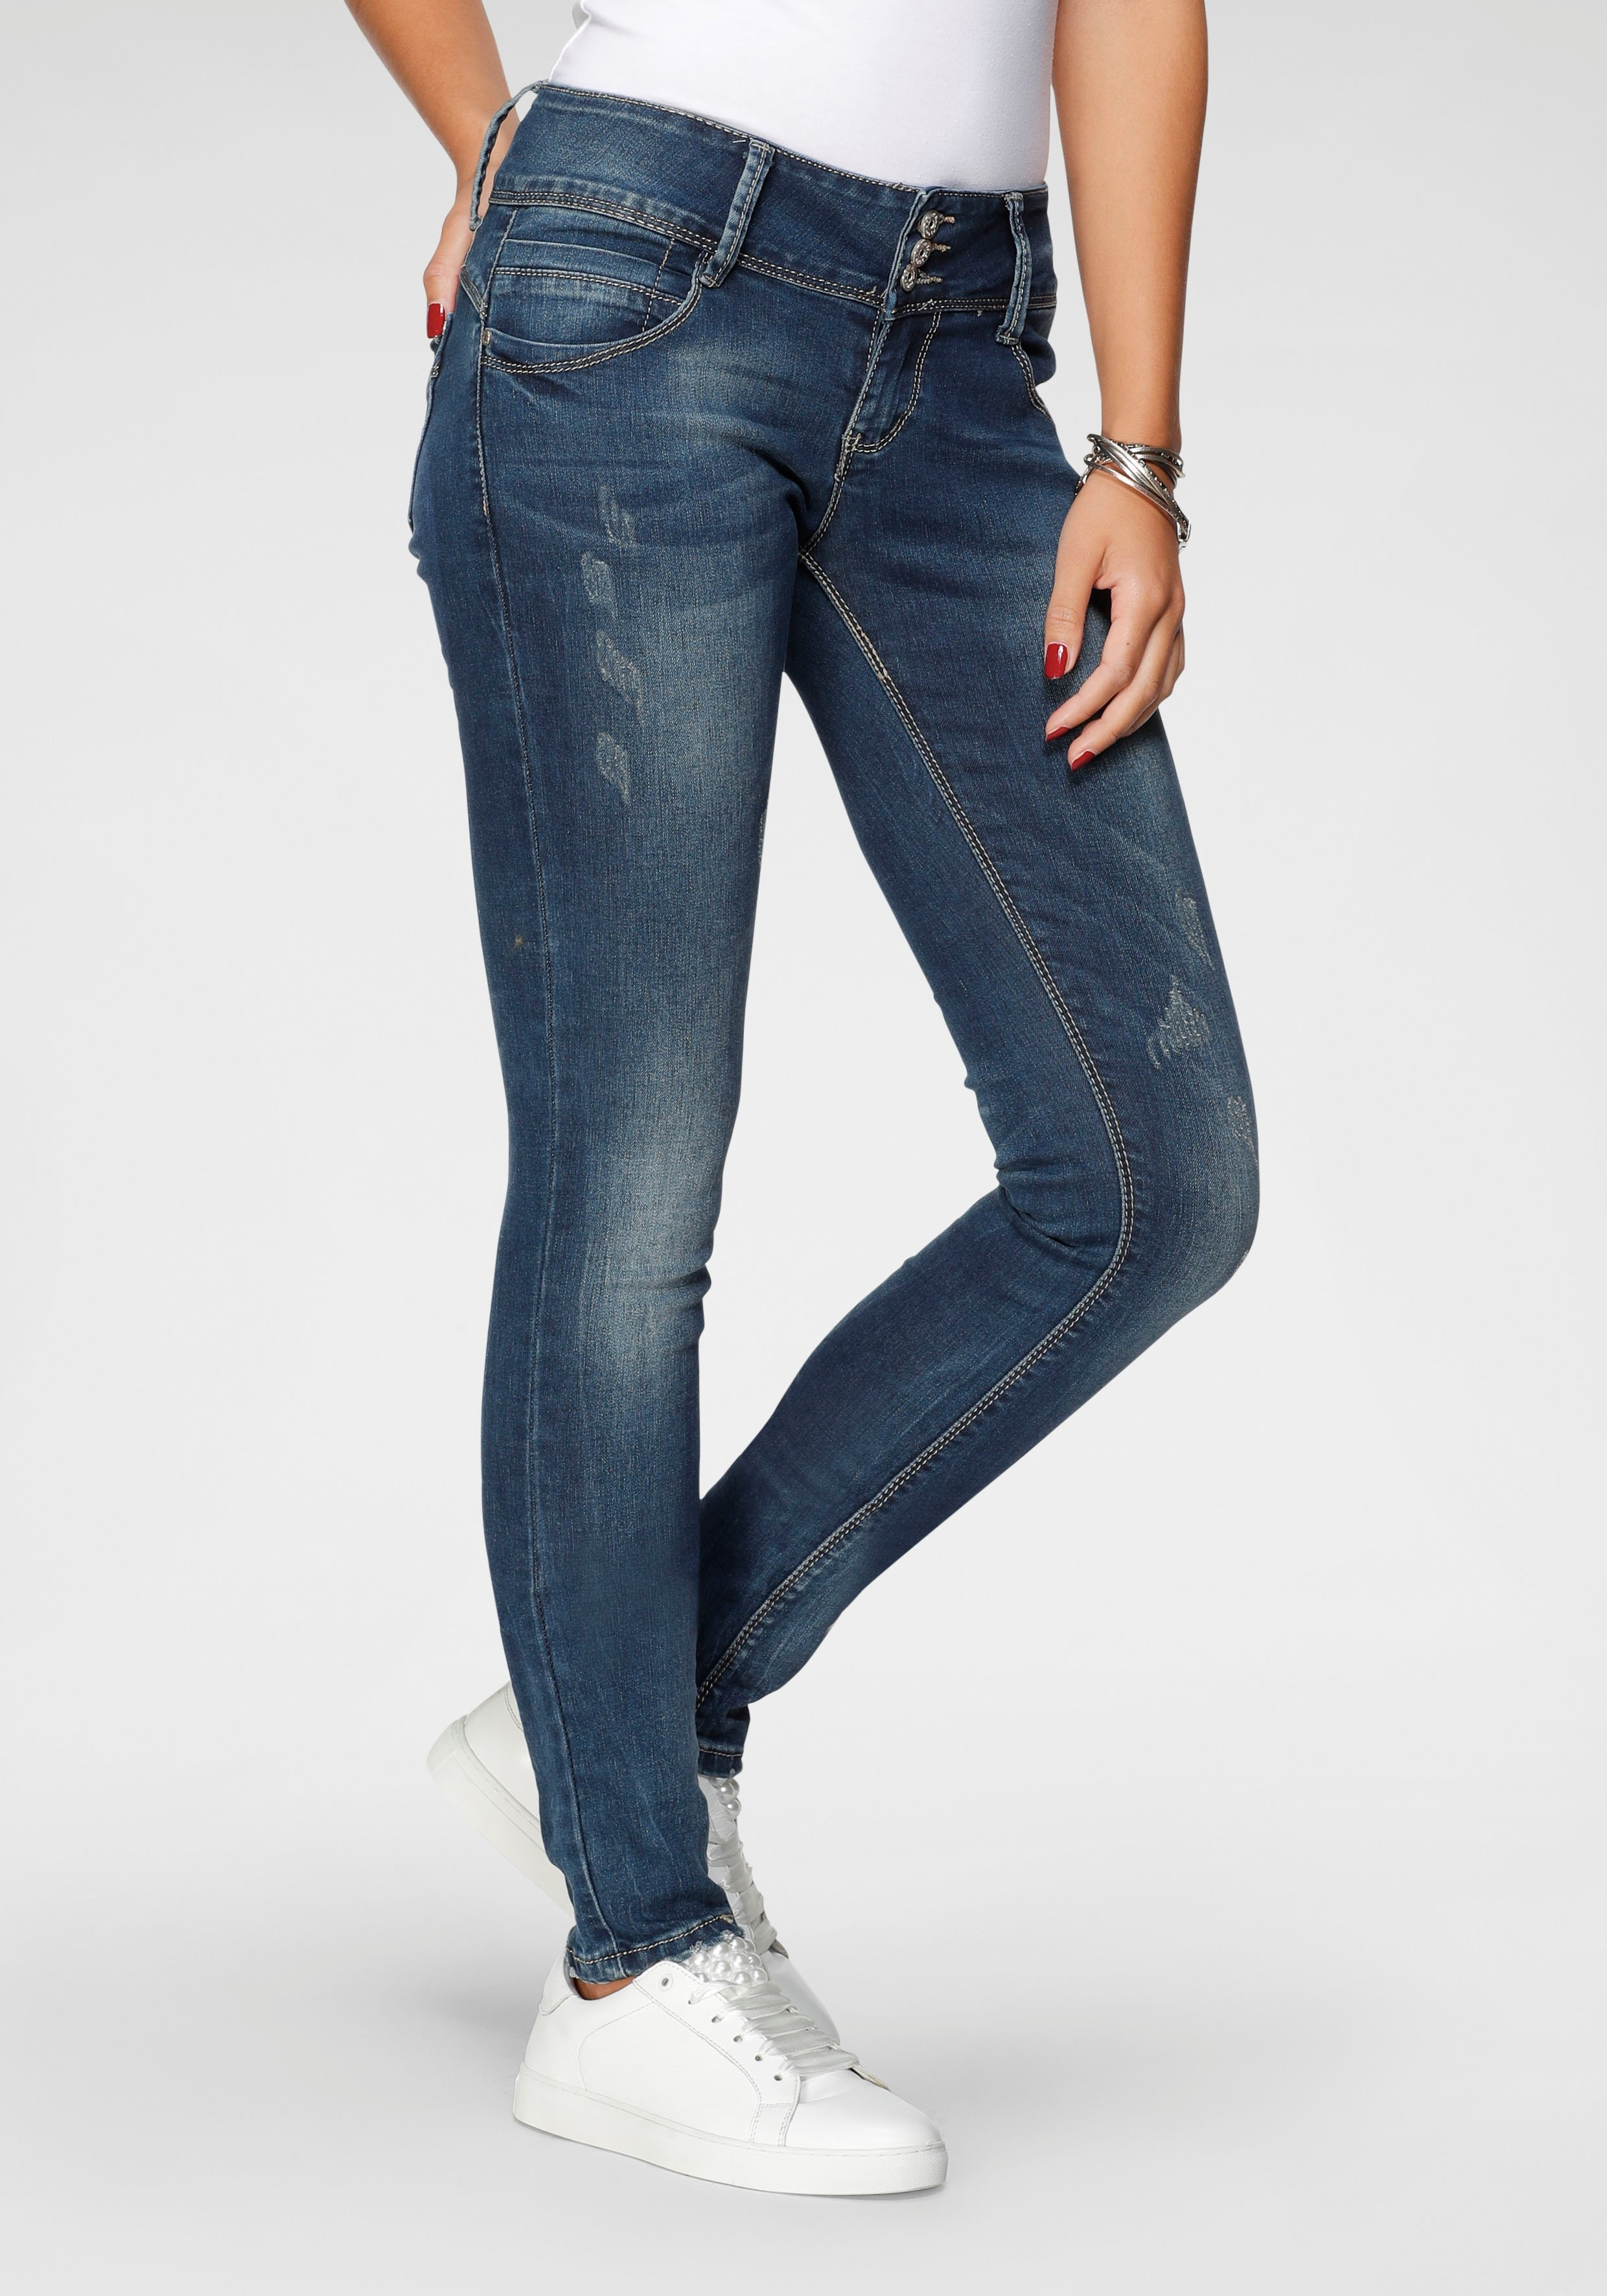 HaILYS skinny fit jeans CAMILA - gratis ruilen op otto.nl